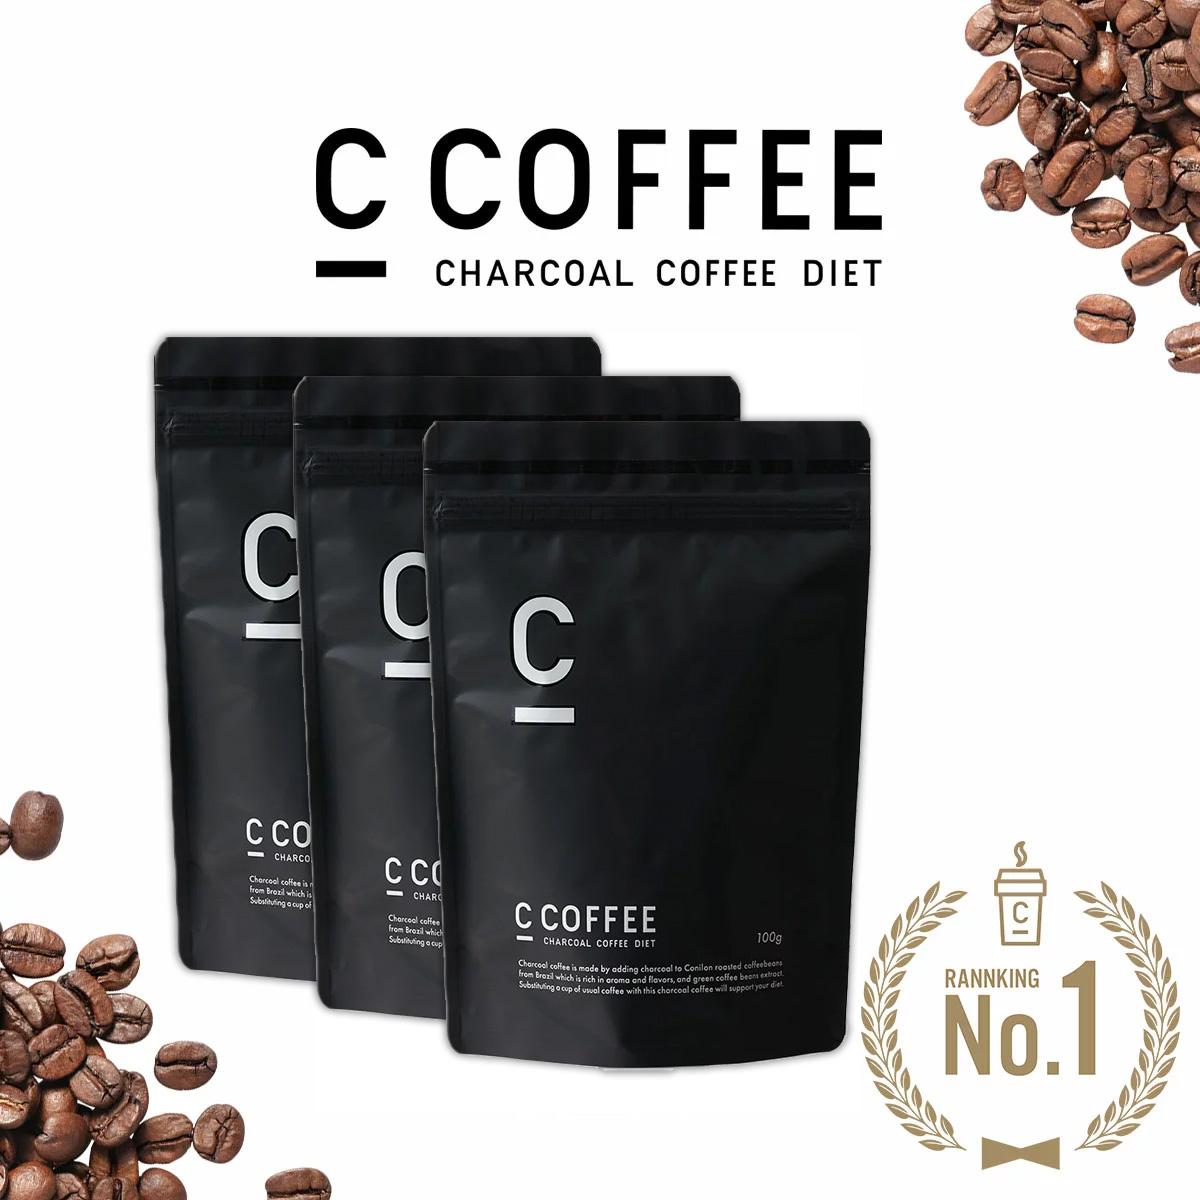 「c coffee」の画像検索結果